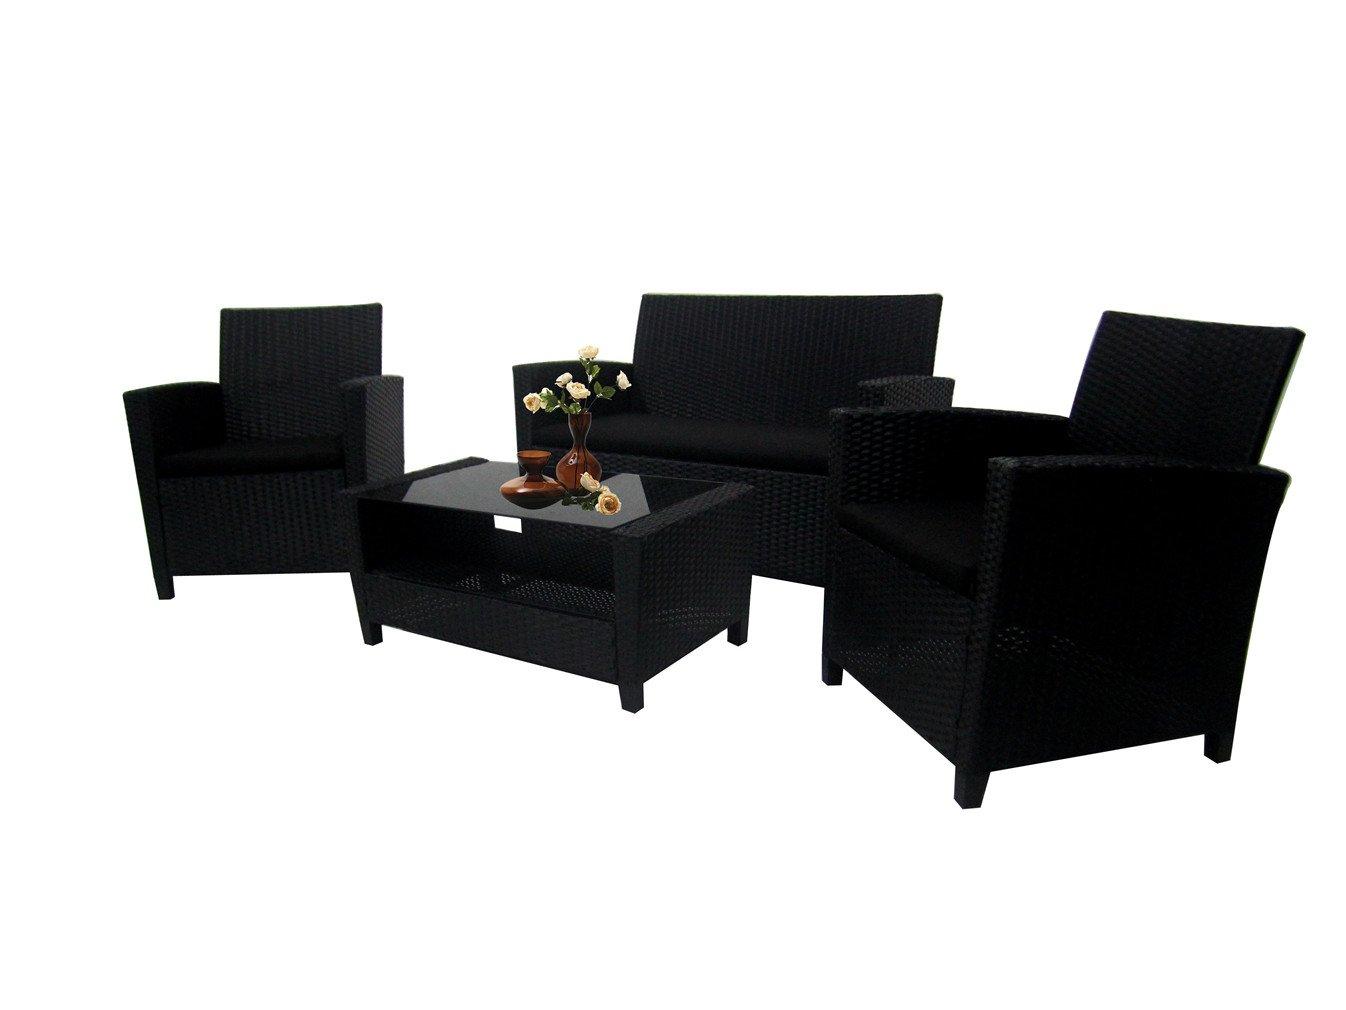 Amazoncom Richly Outdoor Indoor Furniture Set 4 Pieces Patio